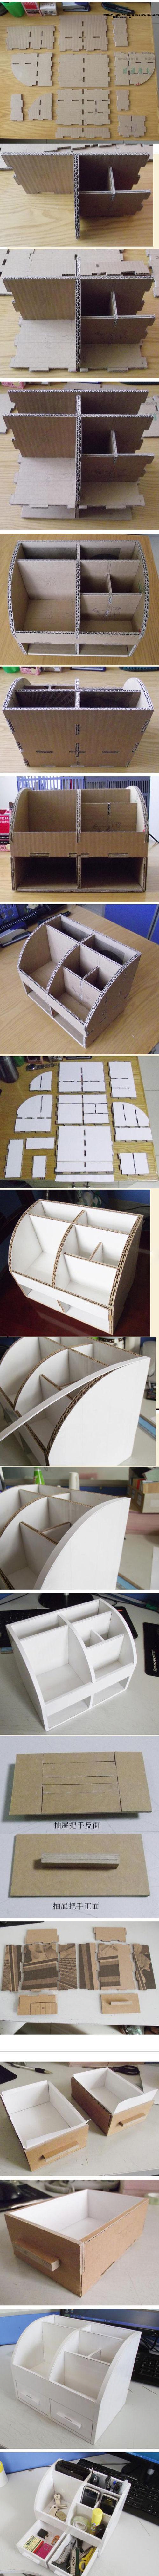 DIY Carton Office Stationery Box DIY Projects / UsefulDIY.com